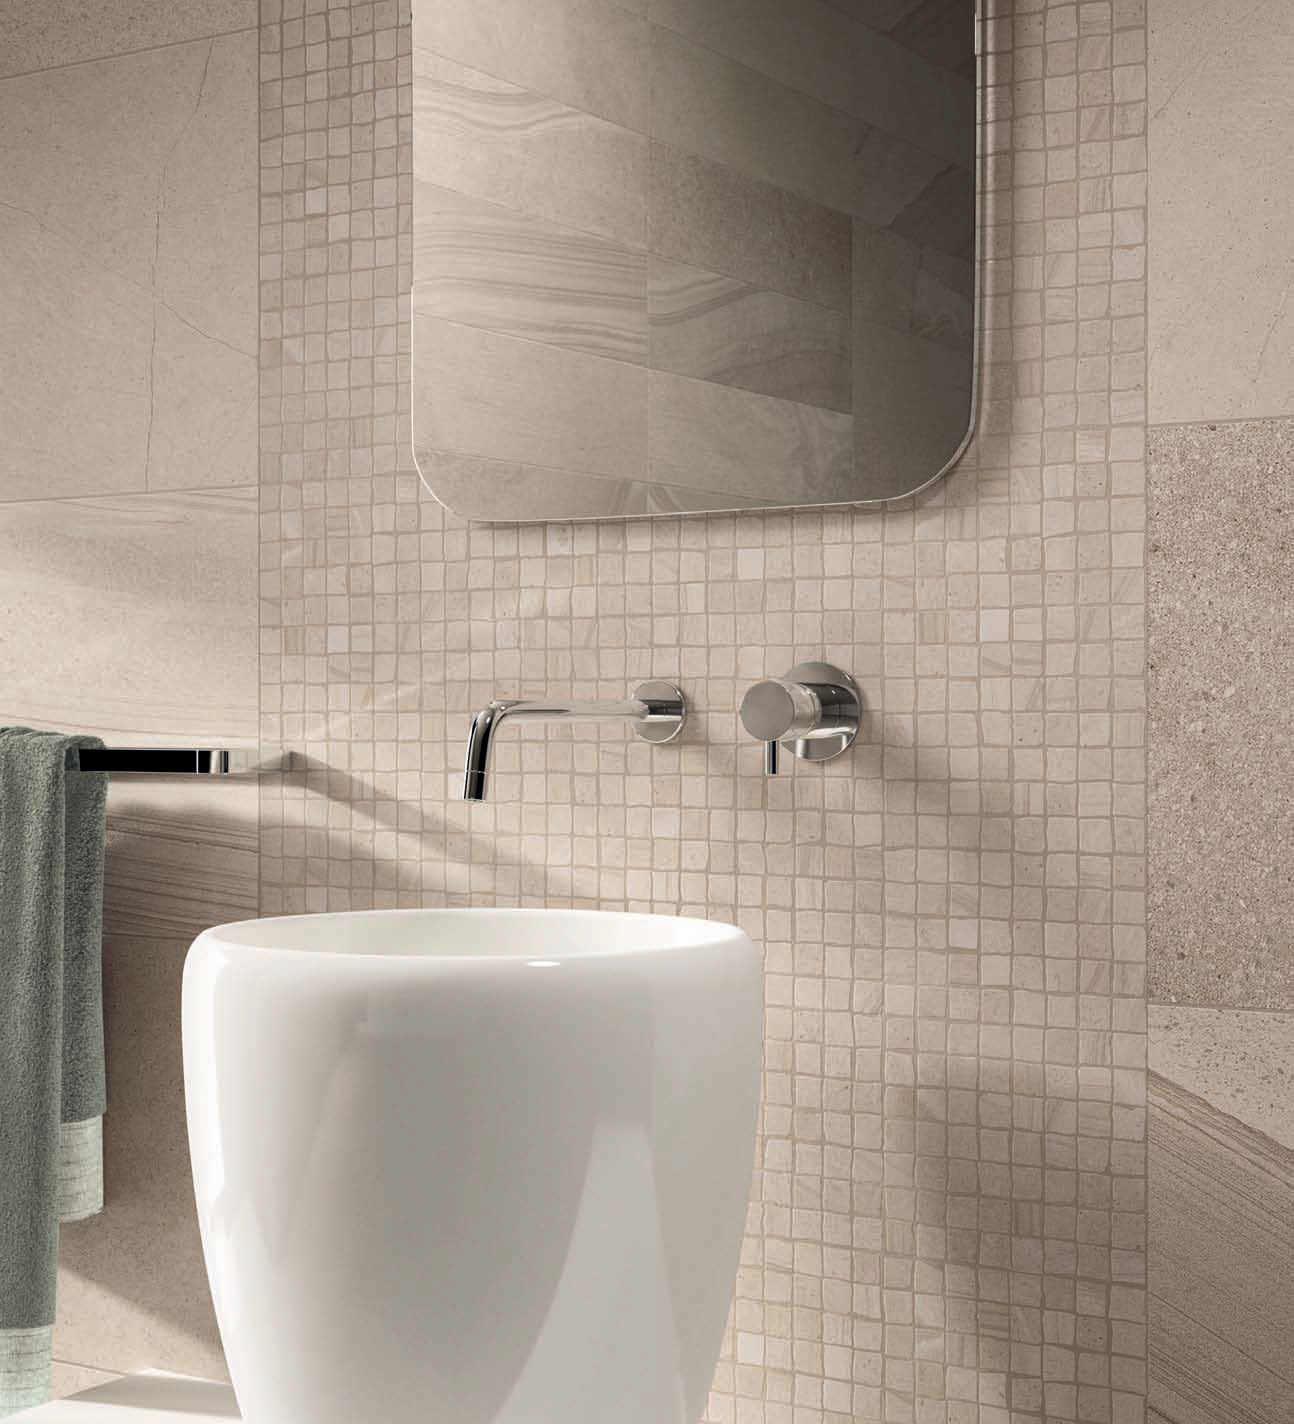 piastrella da bagno da pavimento in ceramica opaca re work multi beige